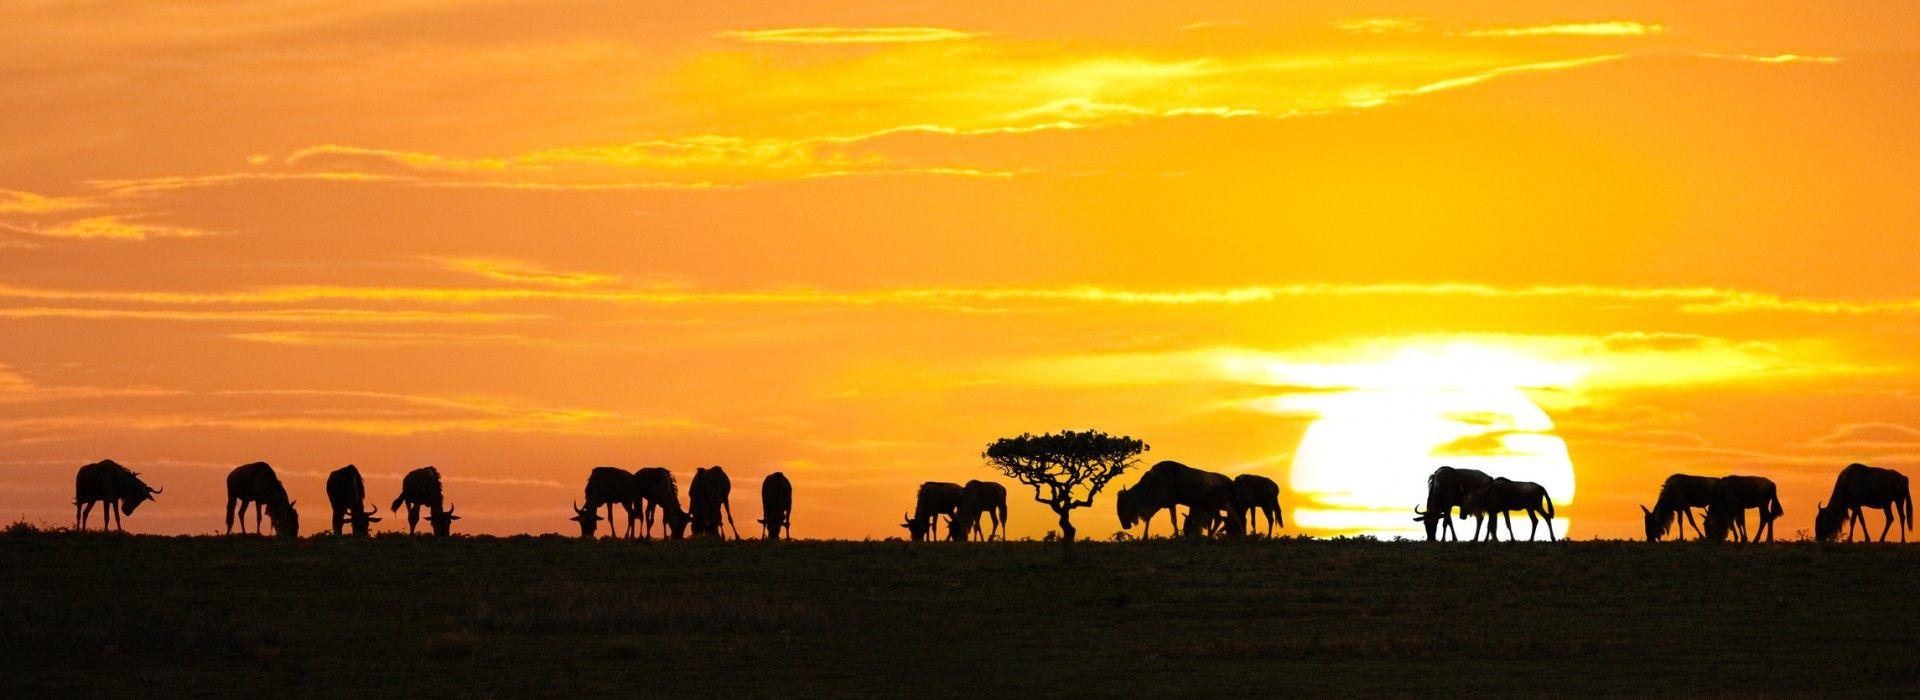 Cultural, religious and historic sites Tours in Tanzania Safari Parks